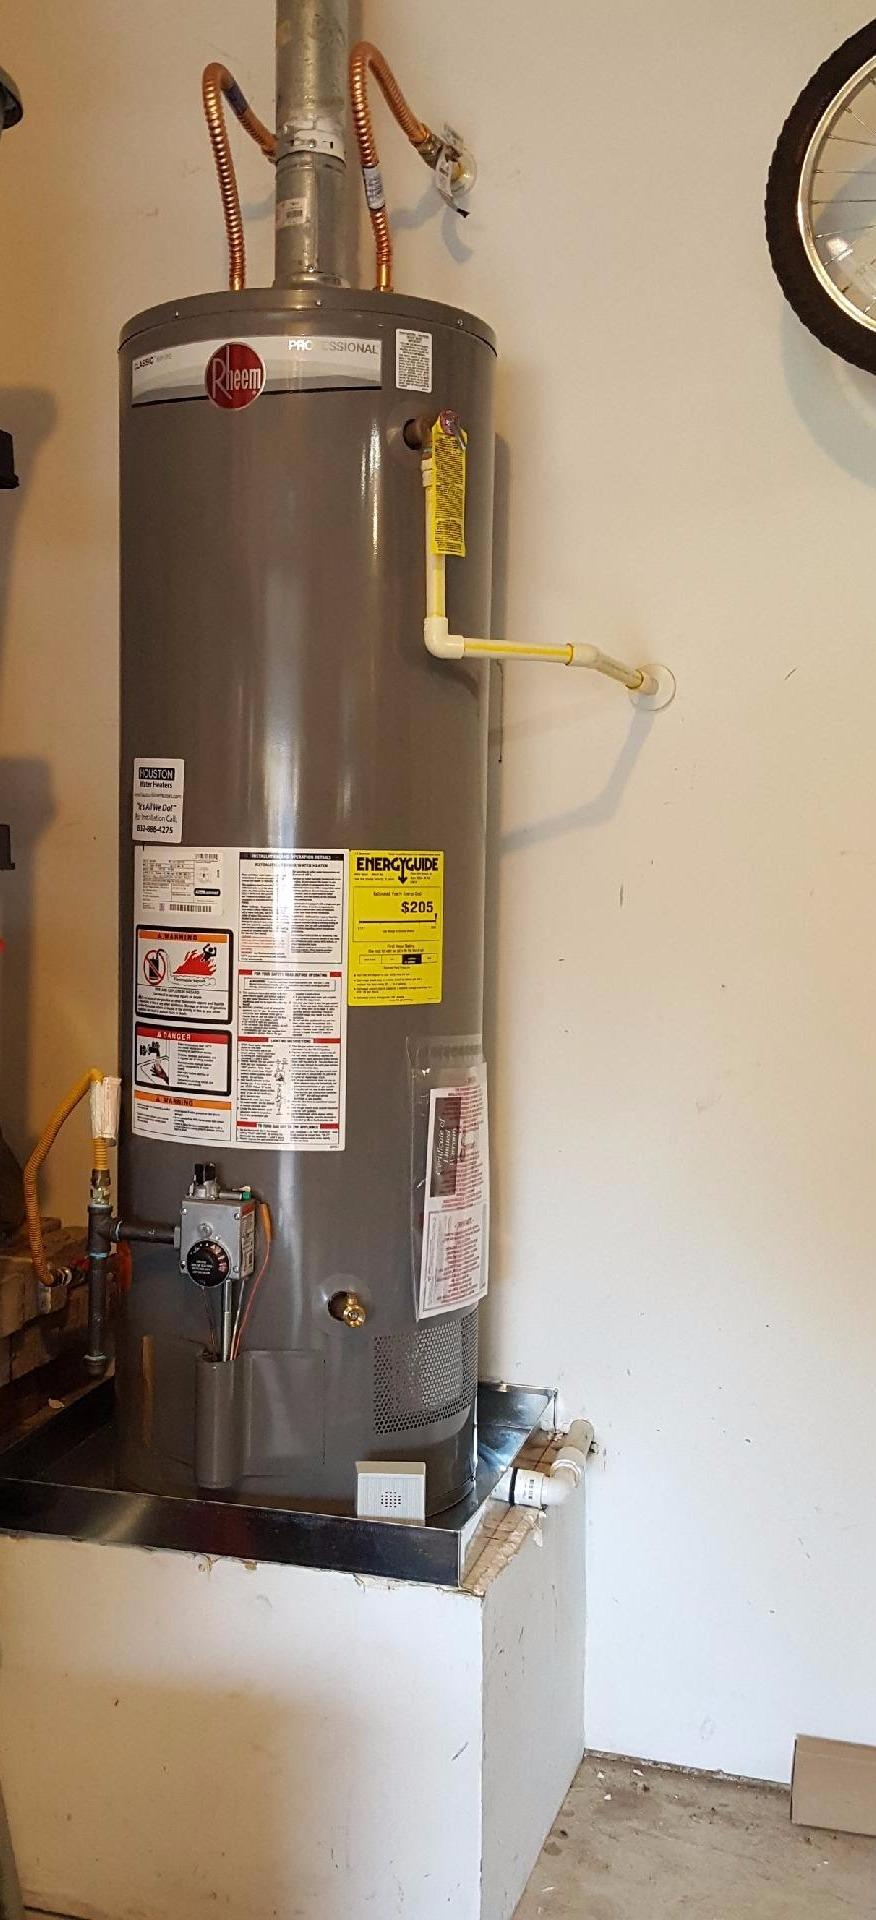 Katy Water Heaters image 54